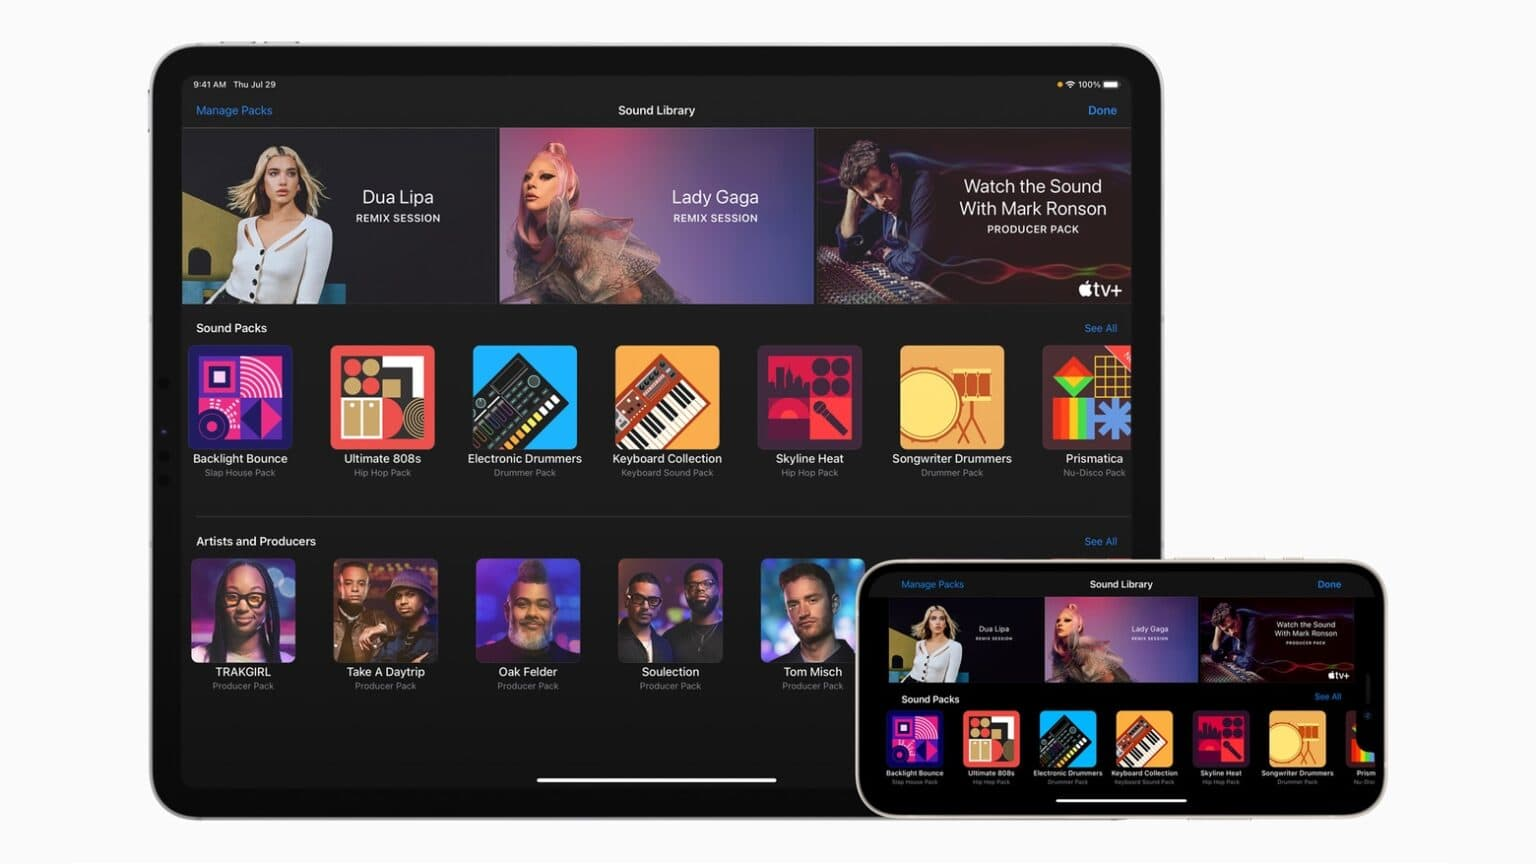 Apple's GarageBand teaches music remixing with Lady Gaga, Dua Lipa songs